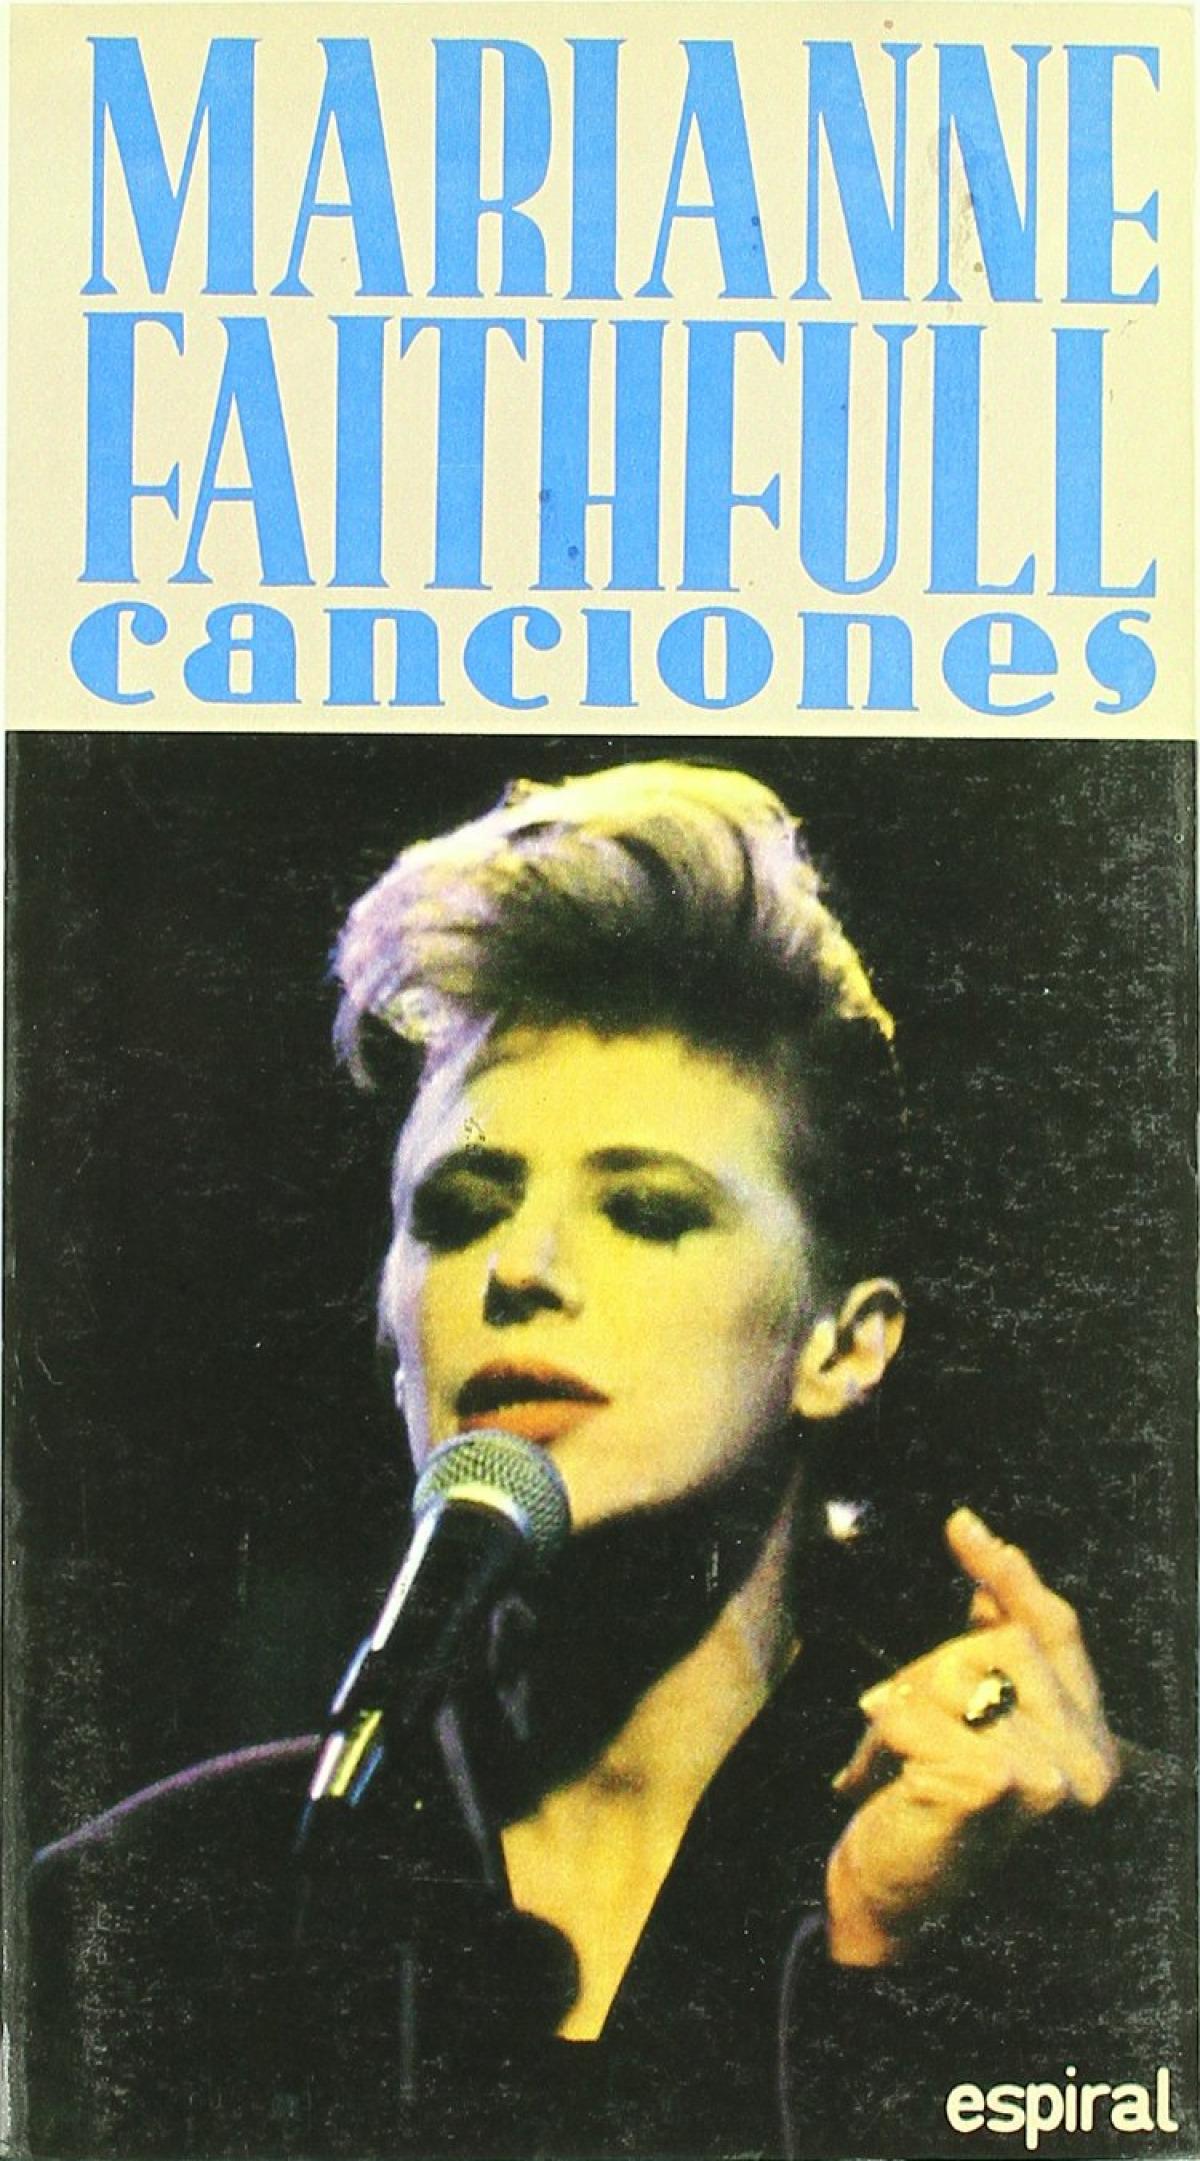 Marianne faithfull canciones - Sin Autor